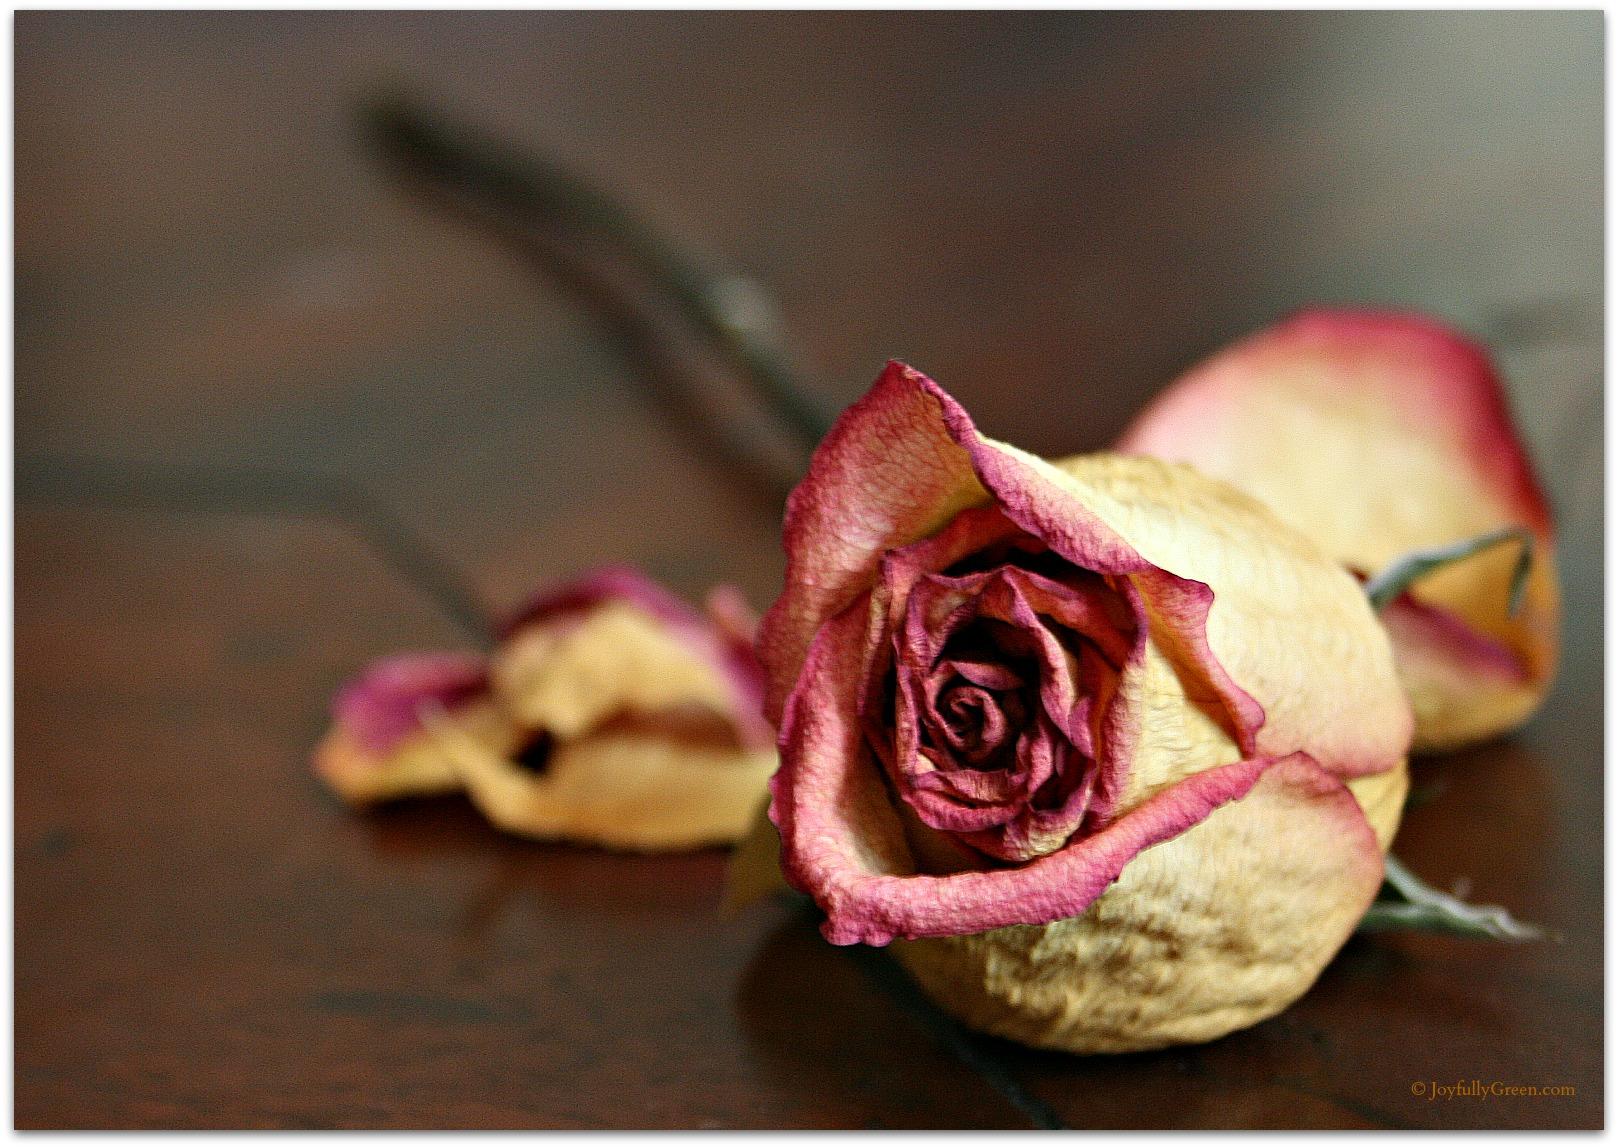 Monday Snapshot: The Fragile Beauty of a Faded Rose - Joyfully Green